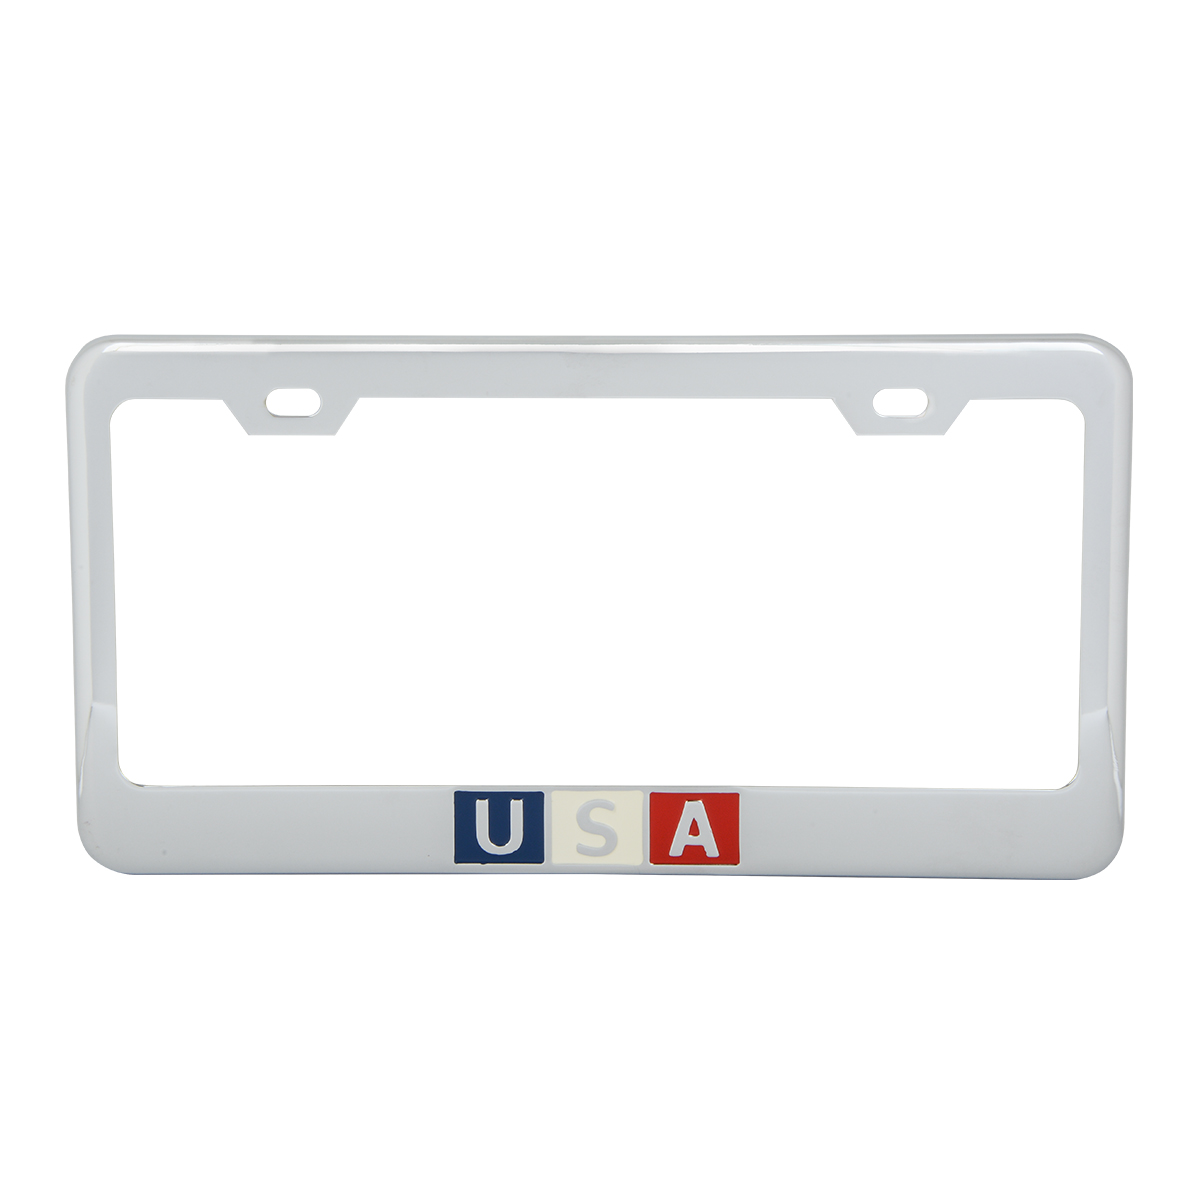 Chrome Plated Steel USA License Plate Frame